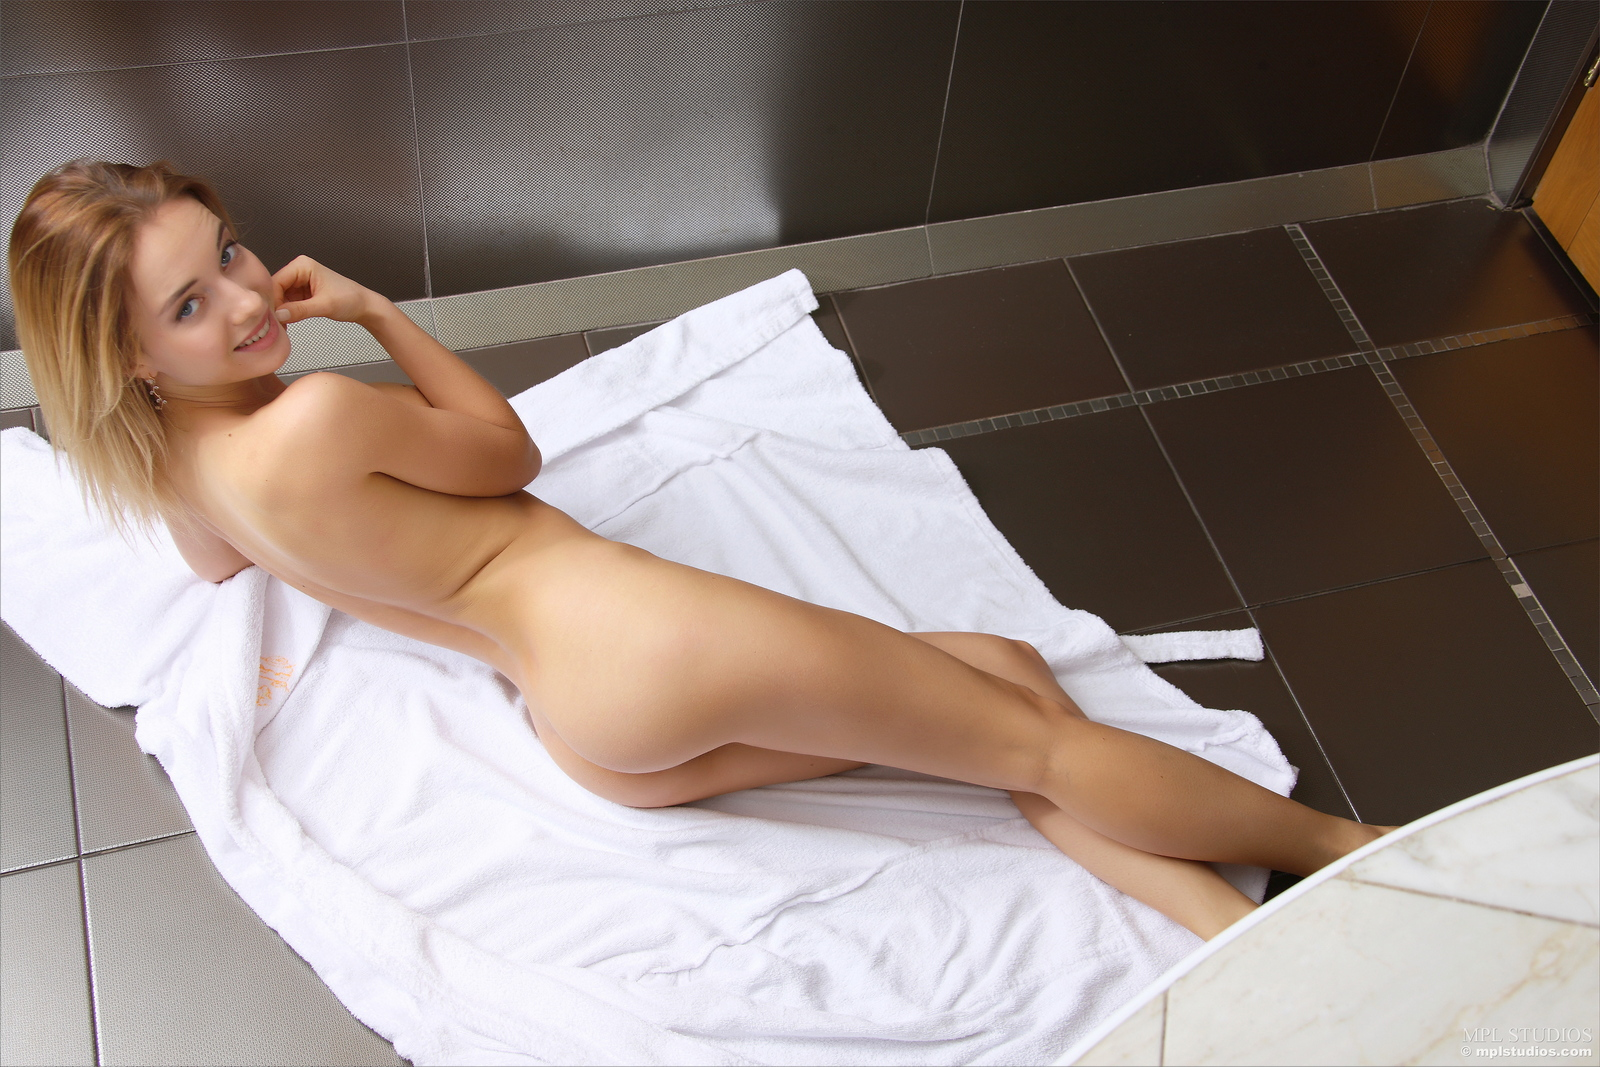 danica-bathroom-blonde-dressing-gown-naked-mplstudios-36